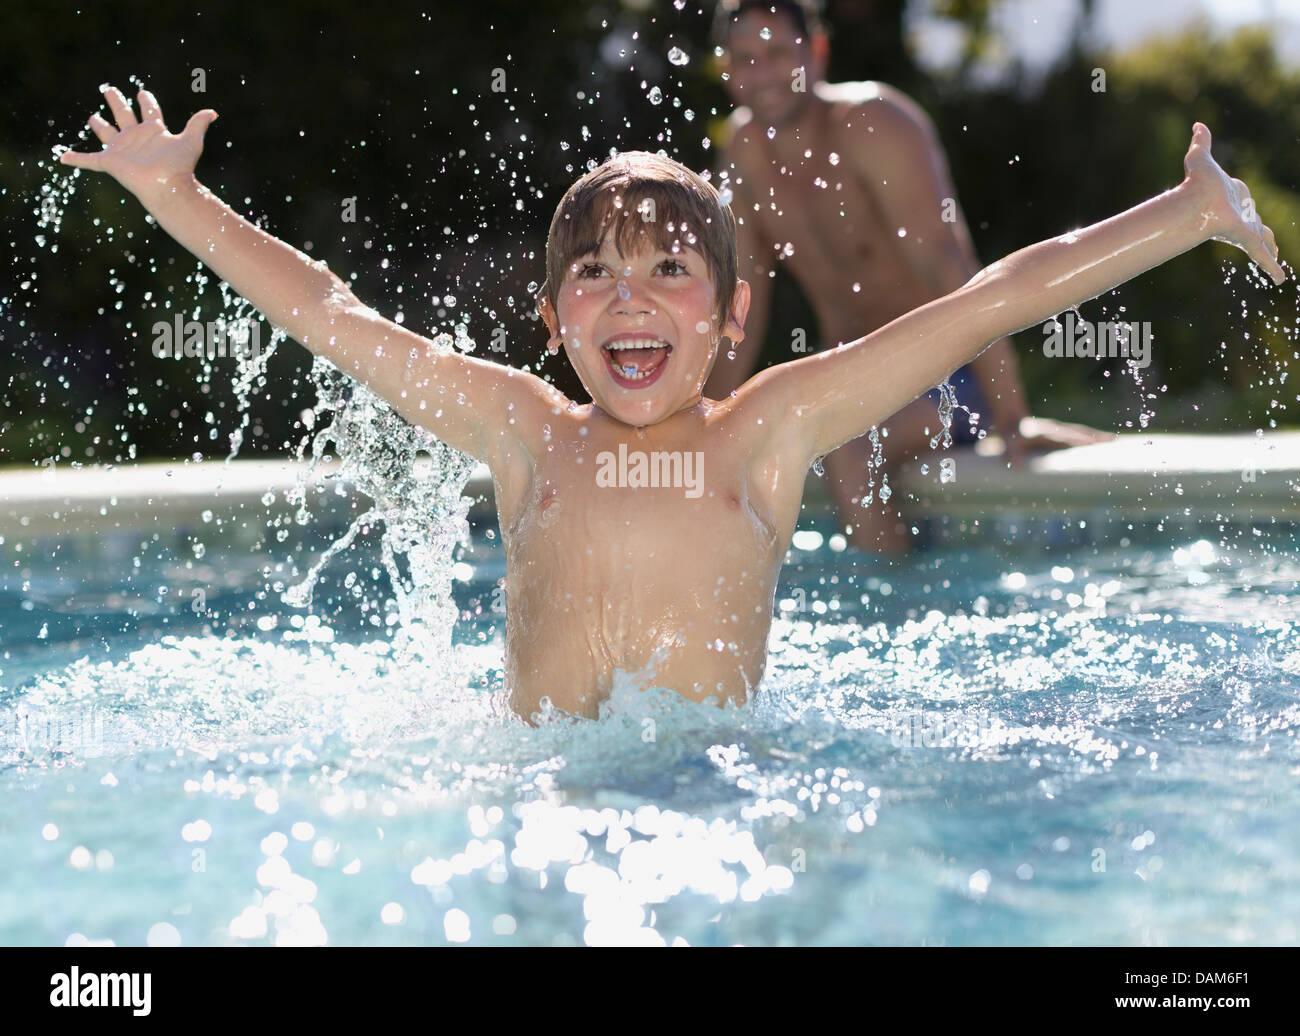 boy-playing-in-swimming-pool-DAM6F1.jpg